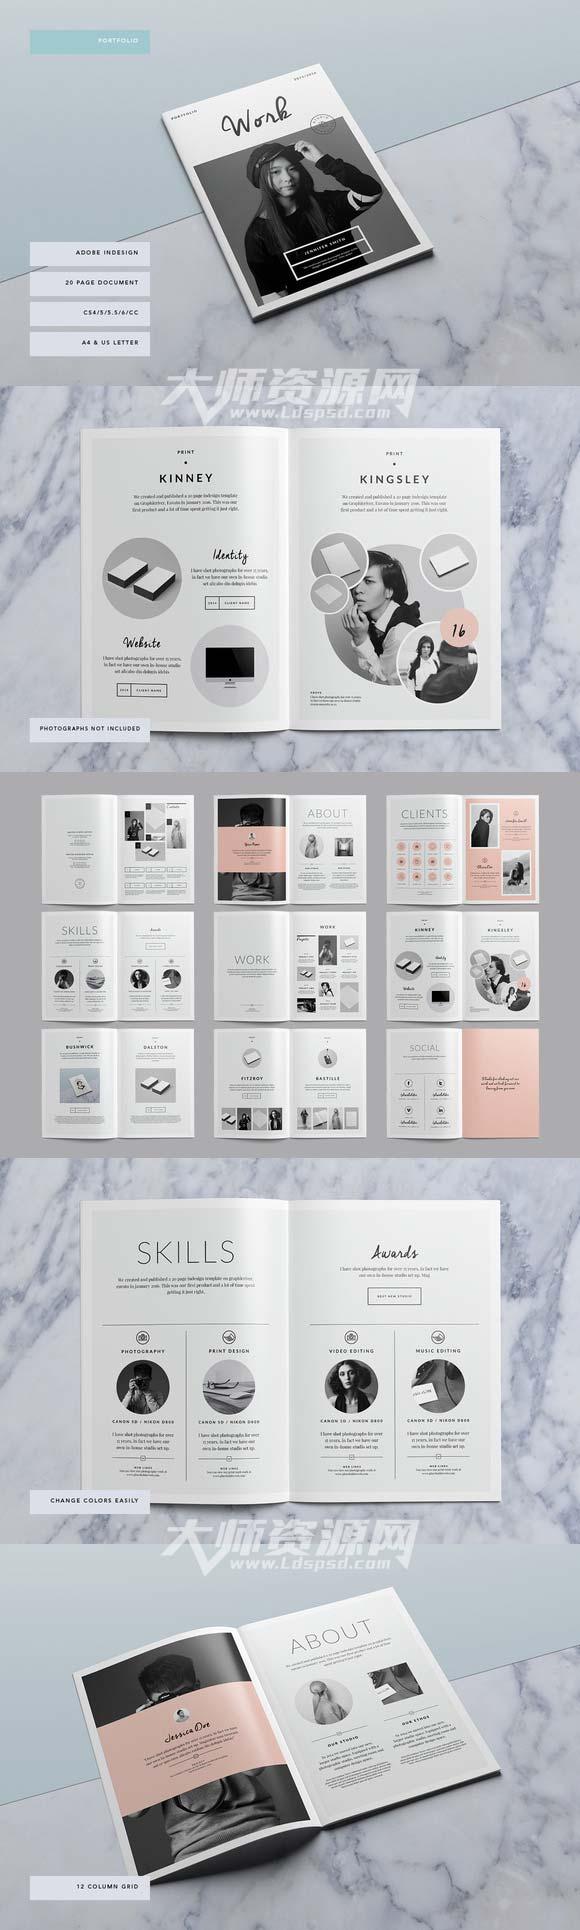 免費:indesign模板-產品宣傳畫冊:bushwick portfolio圖片